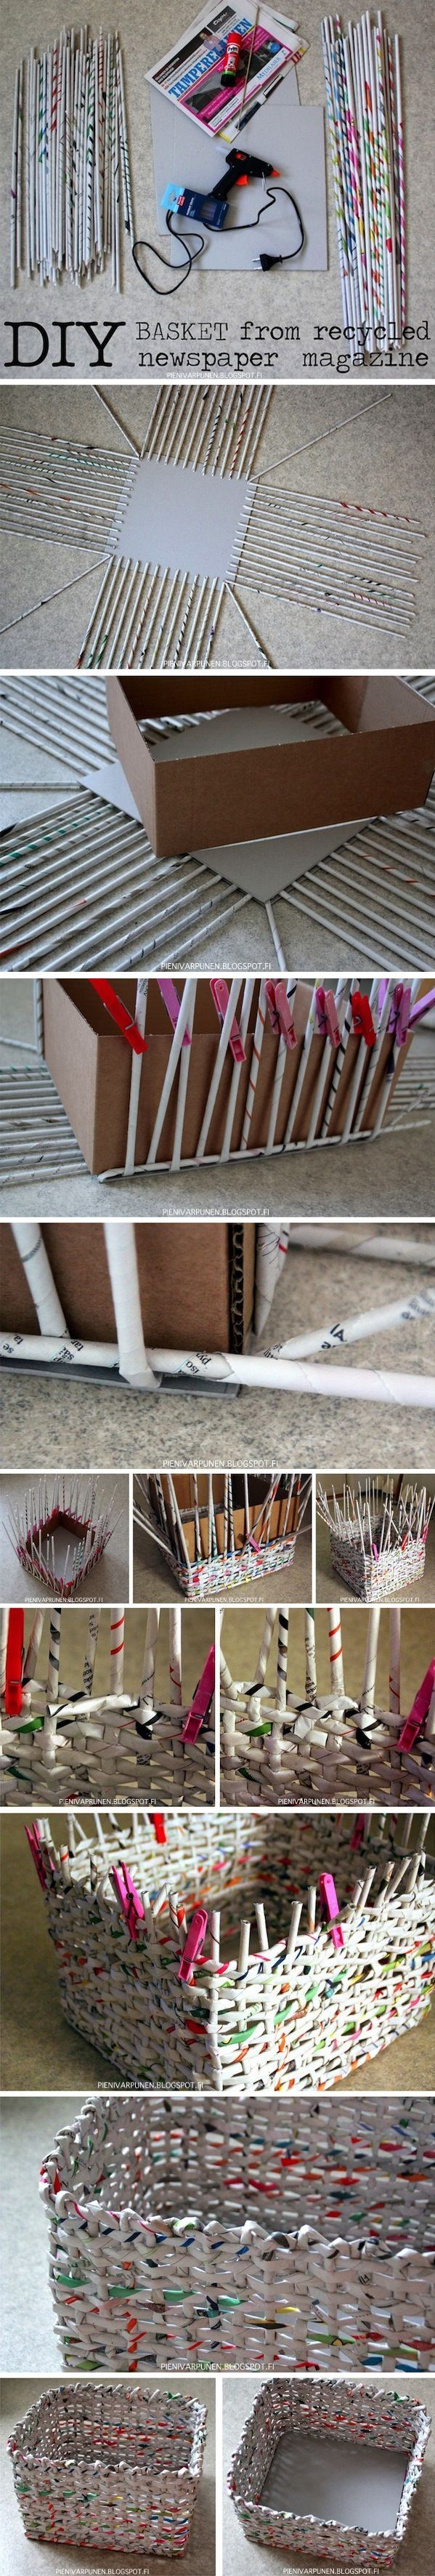 DIY basket from recycled newspaper magazines ( http://pienivarpunen.blogspot.com/2013/09/diy-sanomalehdista-itse-punottuja-koreja.html ):